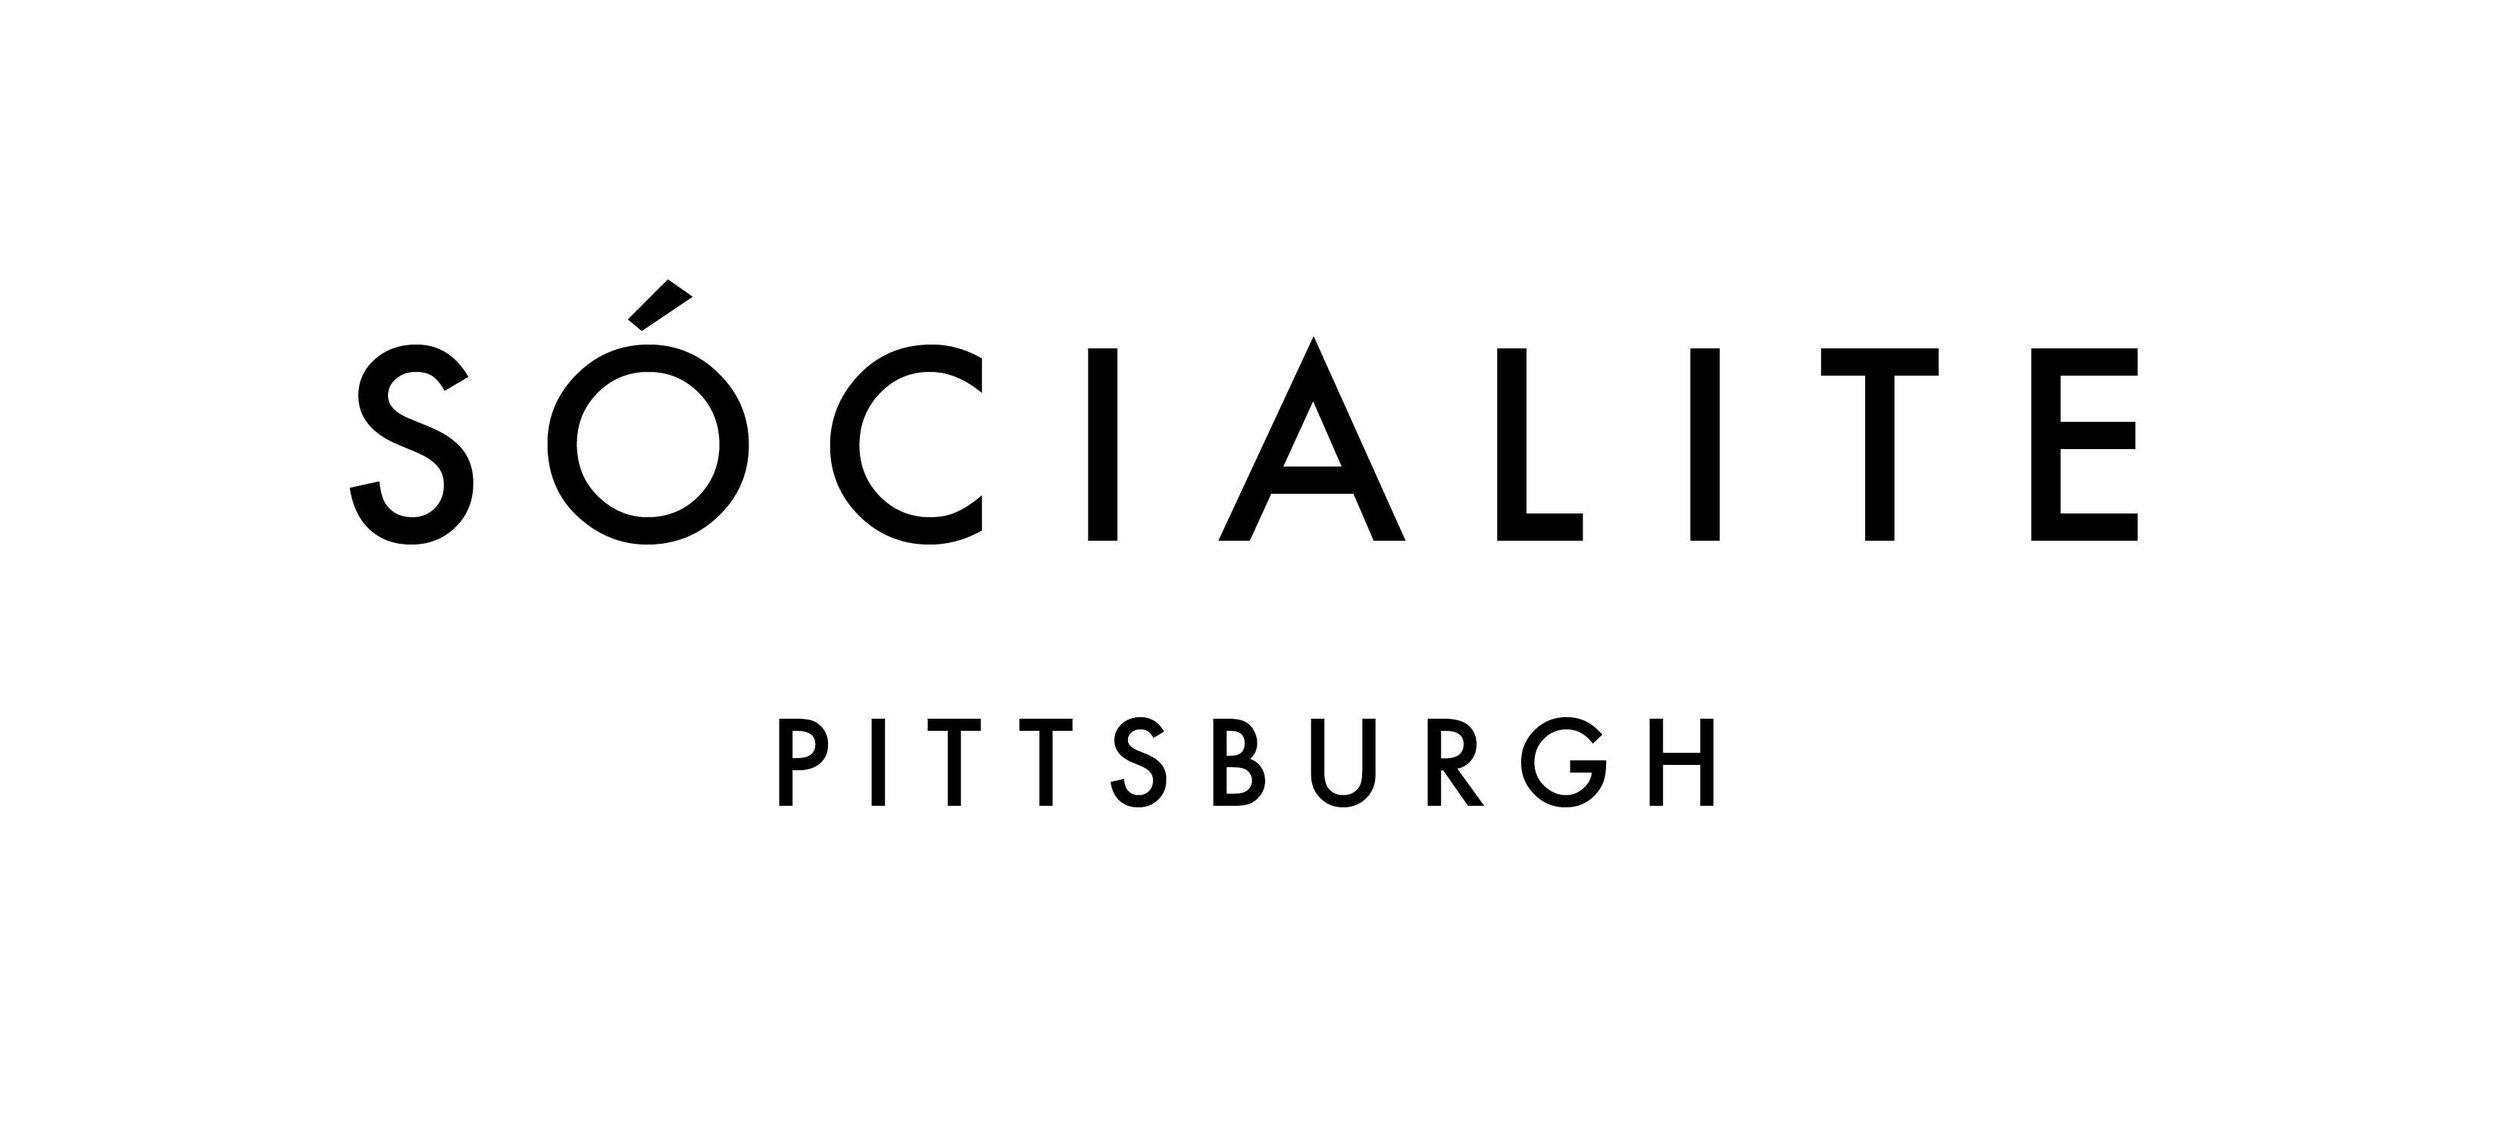 PGH_SOCIALITE_TS2.jpg